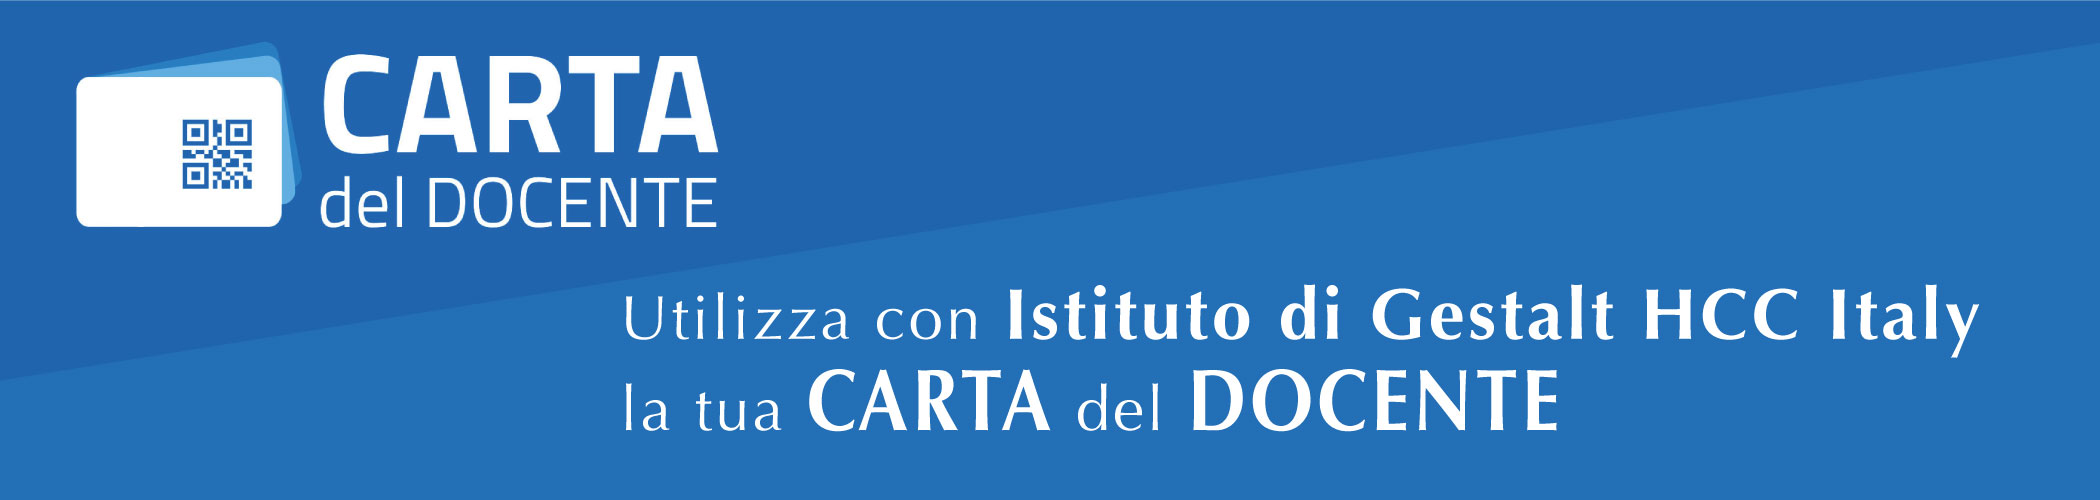 Banner-carta-del-docente3